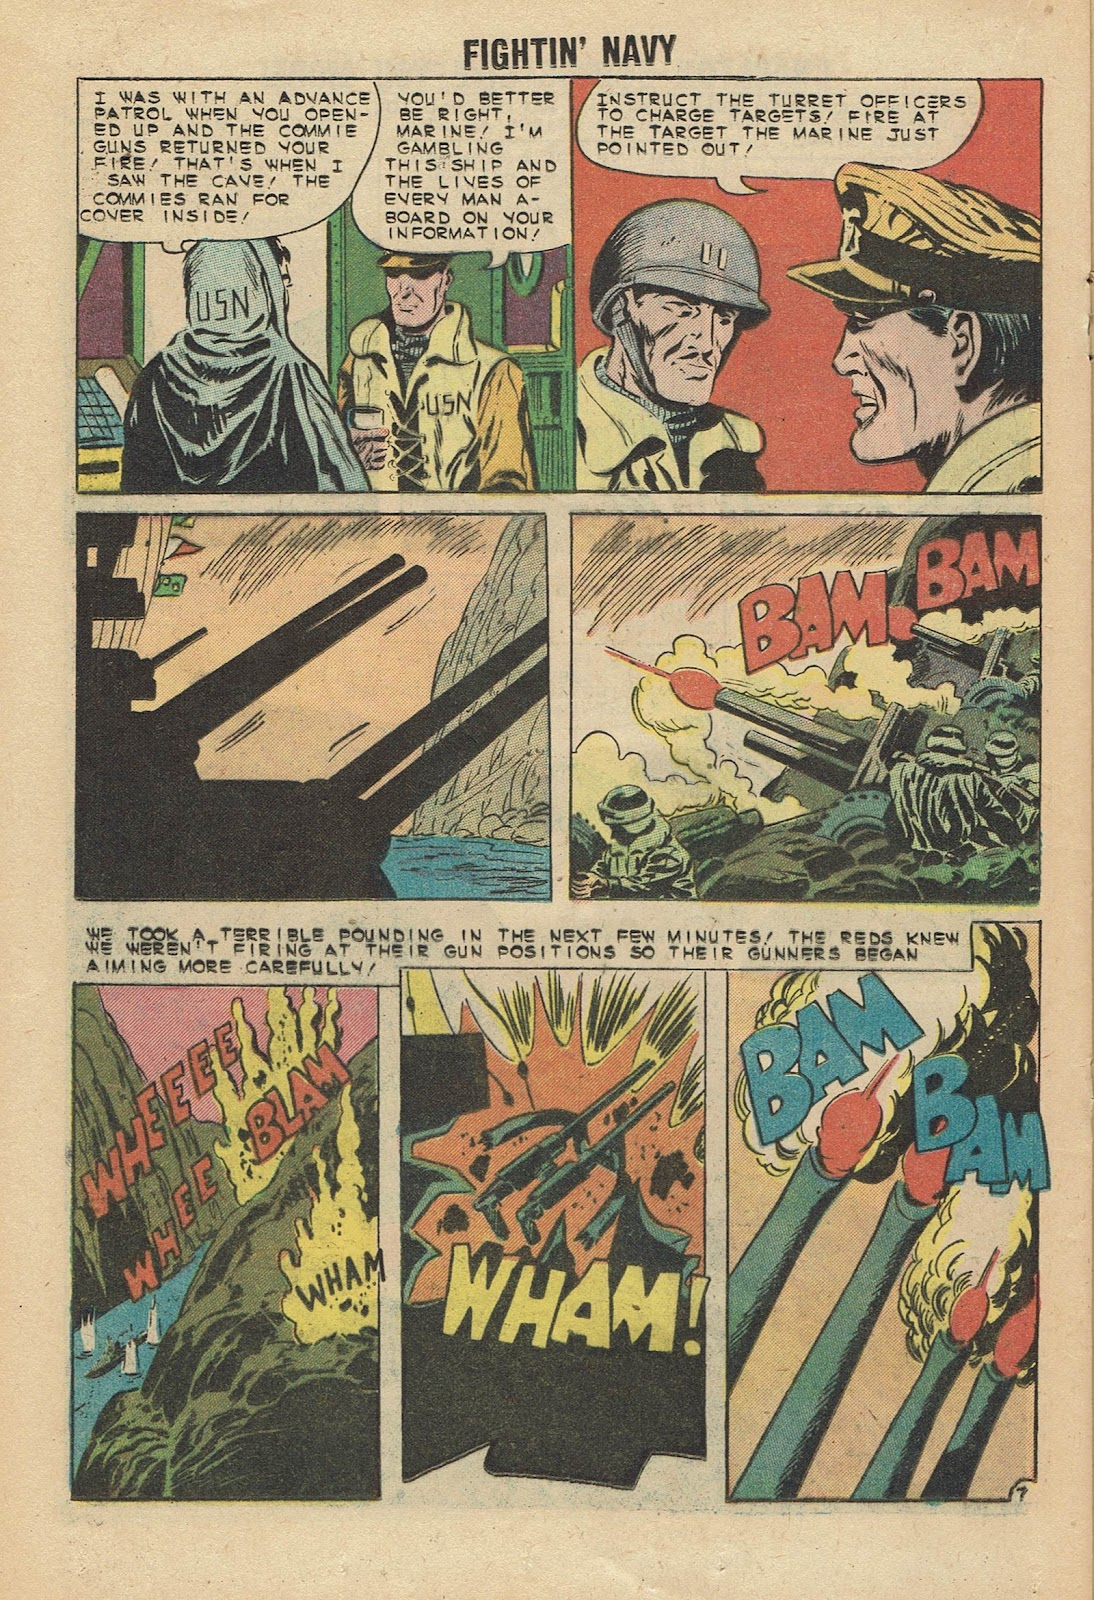 Read online Fightin' Navy comic -  Issue #96 - 20